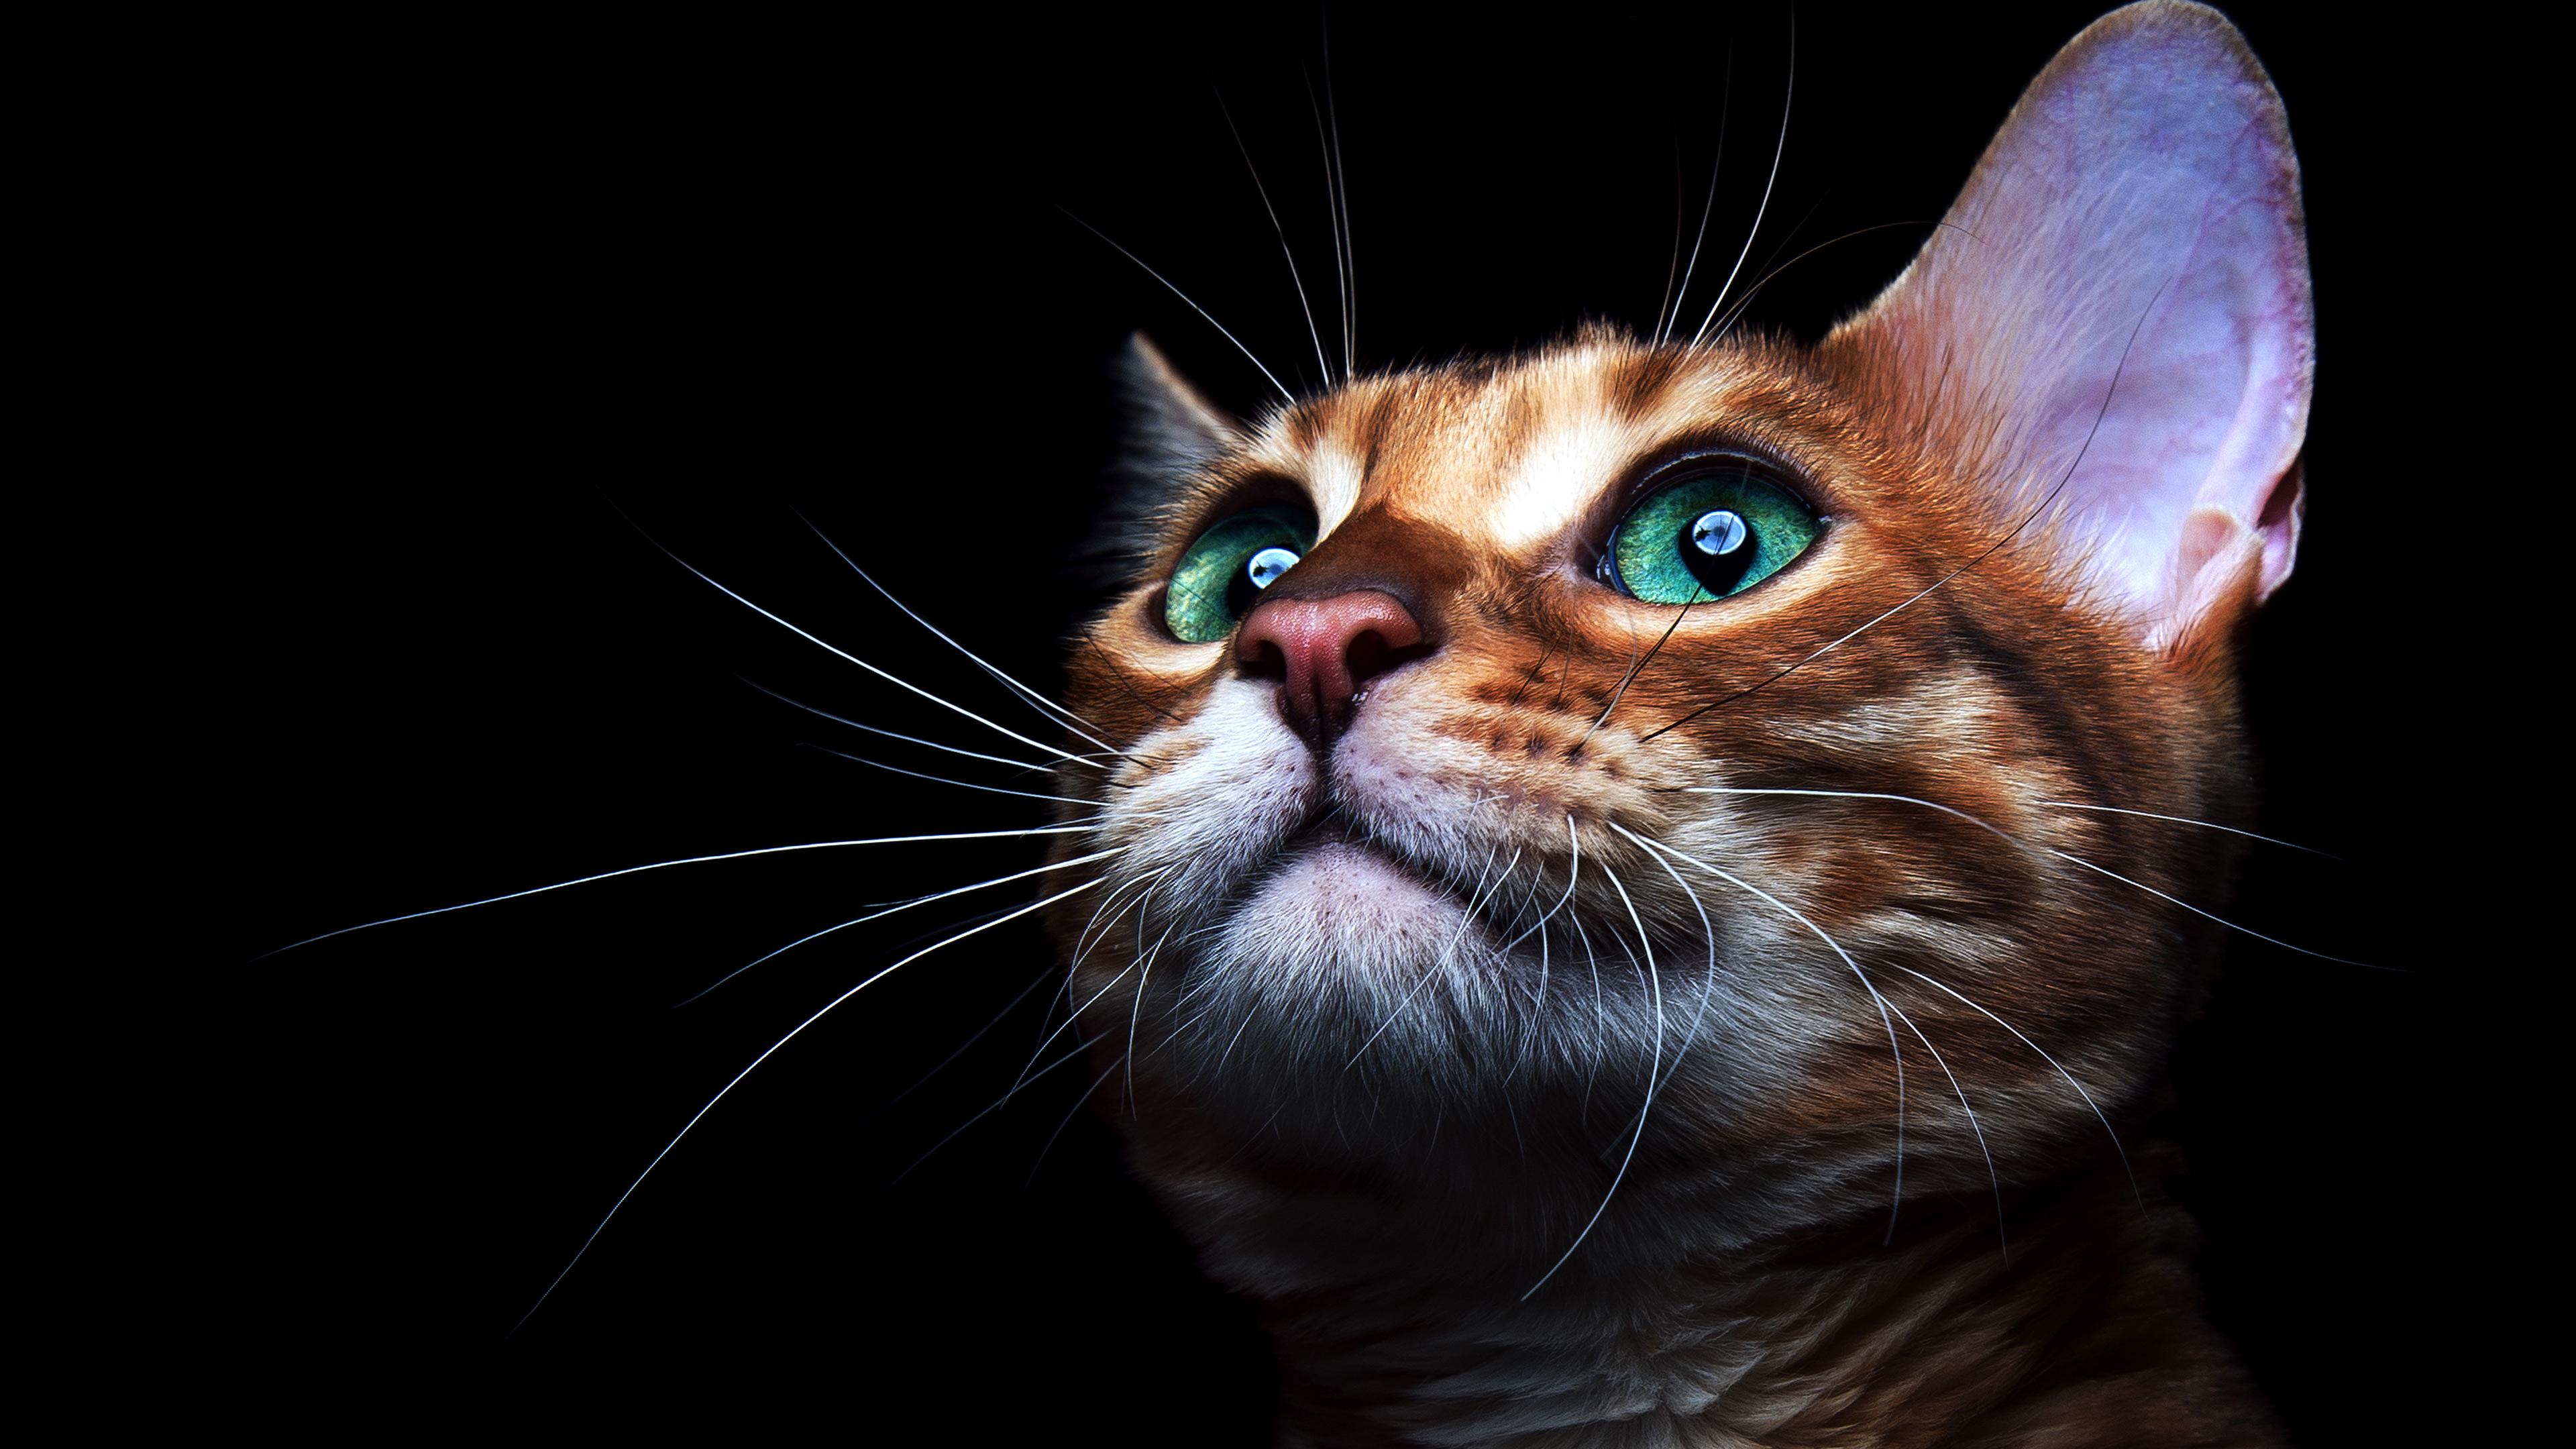 cat deep sea green eyes hd animals 4k wallpapers images